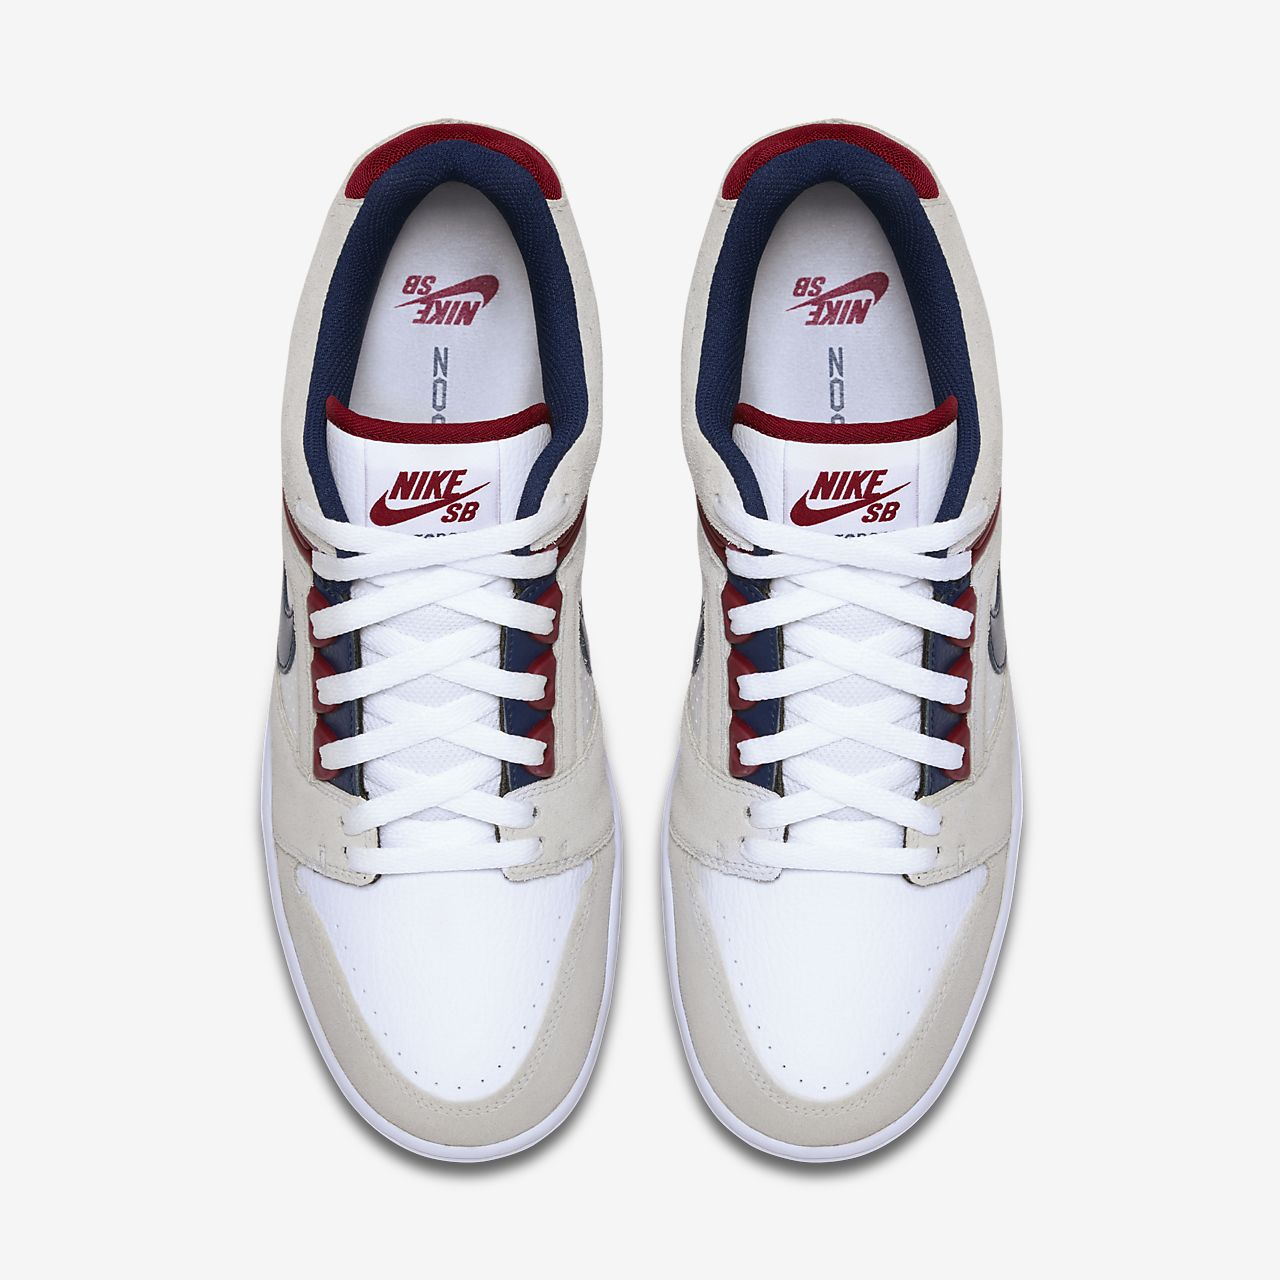 Nike SB Air Force II Low Men s Skateboarding Shoe